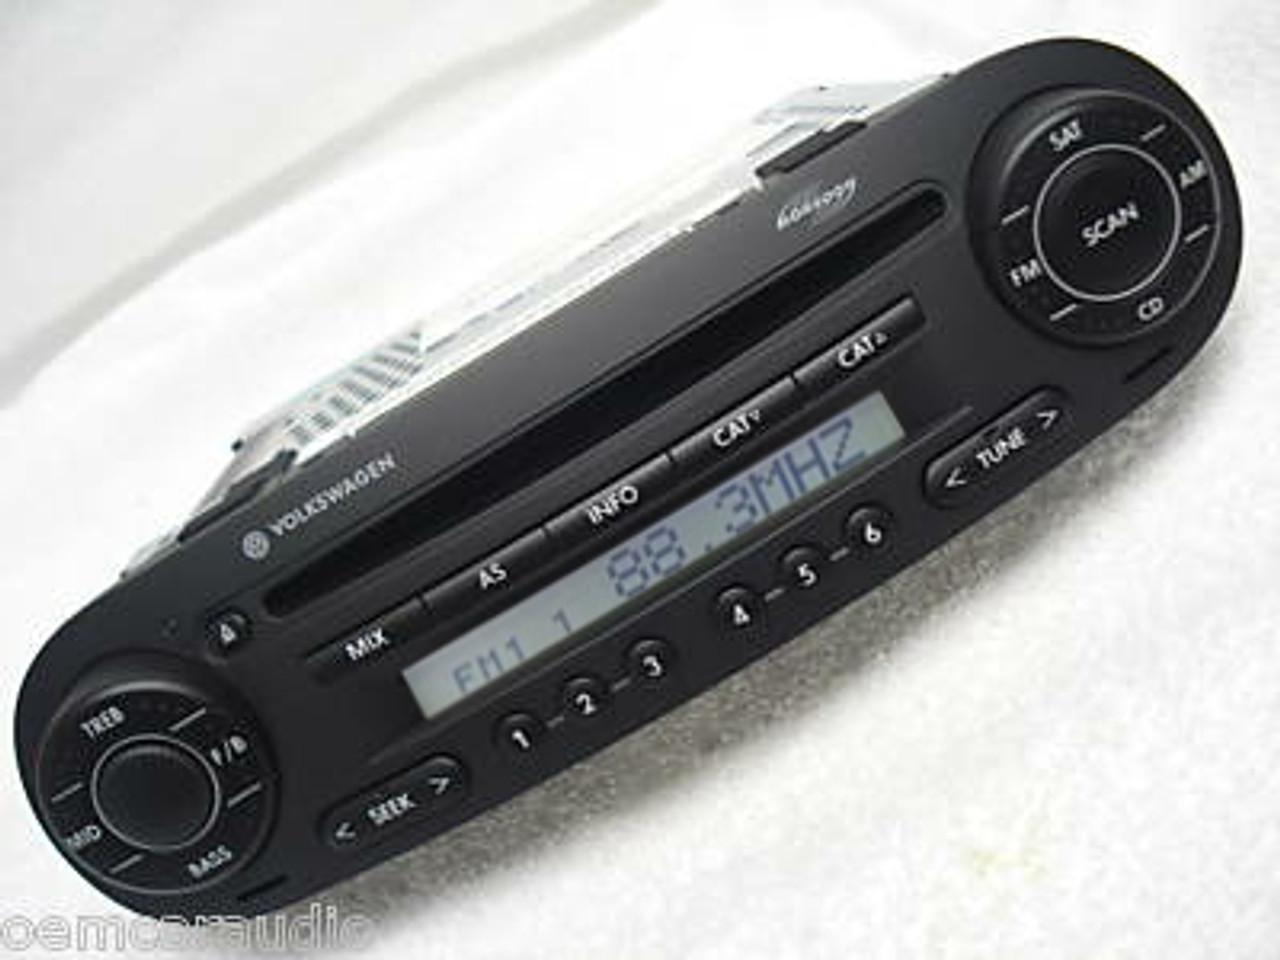 98 01 05 10 Volkswagen Beetle Cd Player Am Fm Radio Stereo